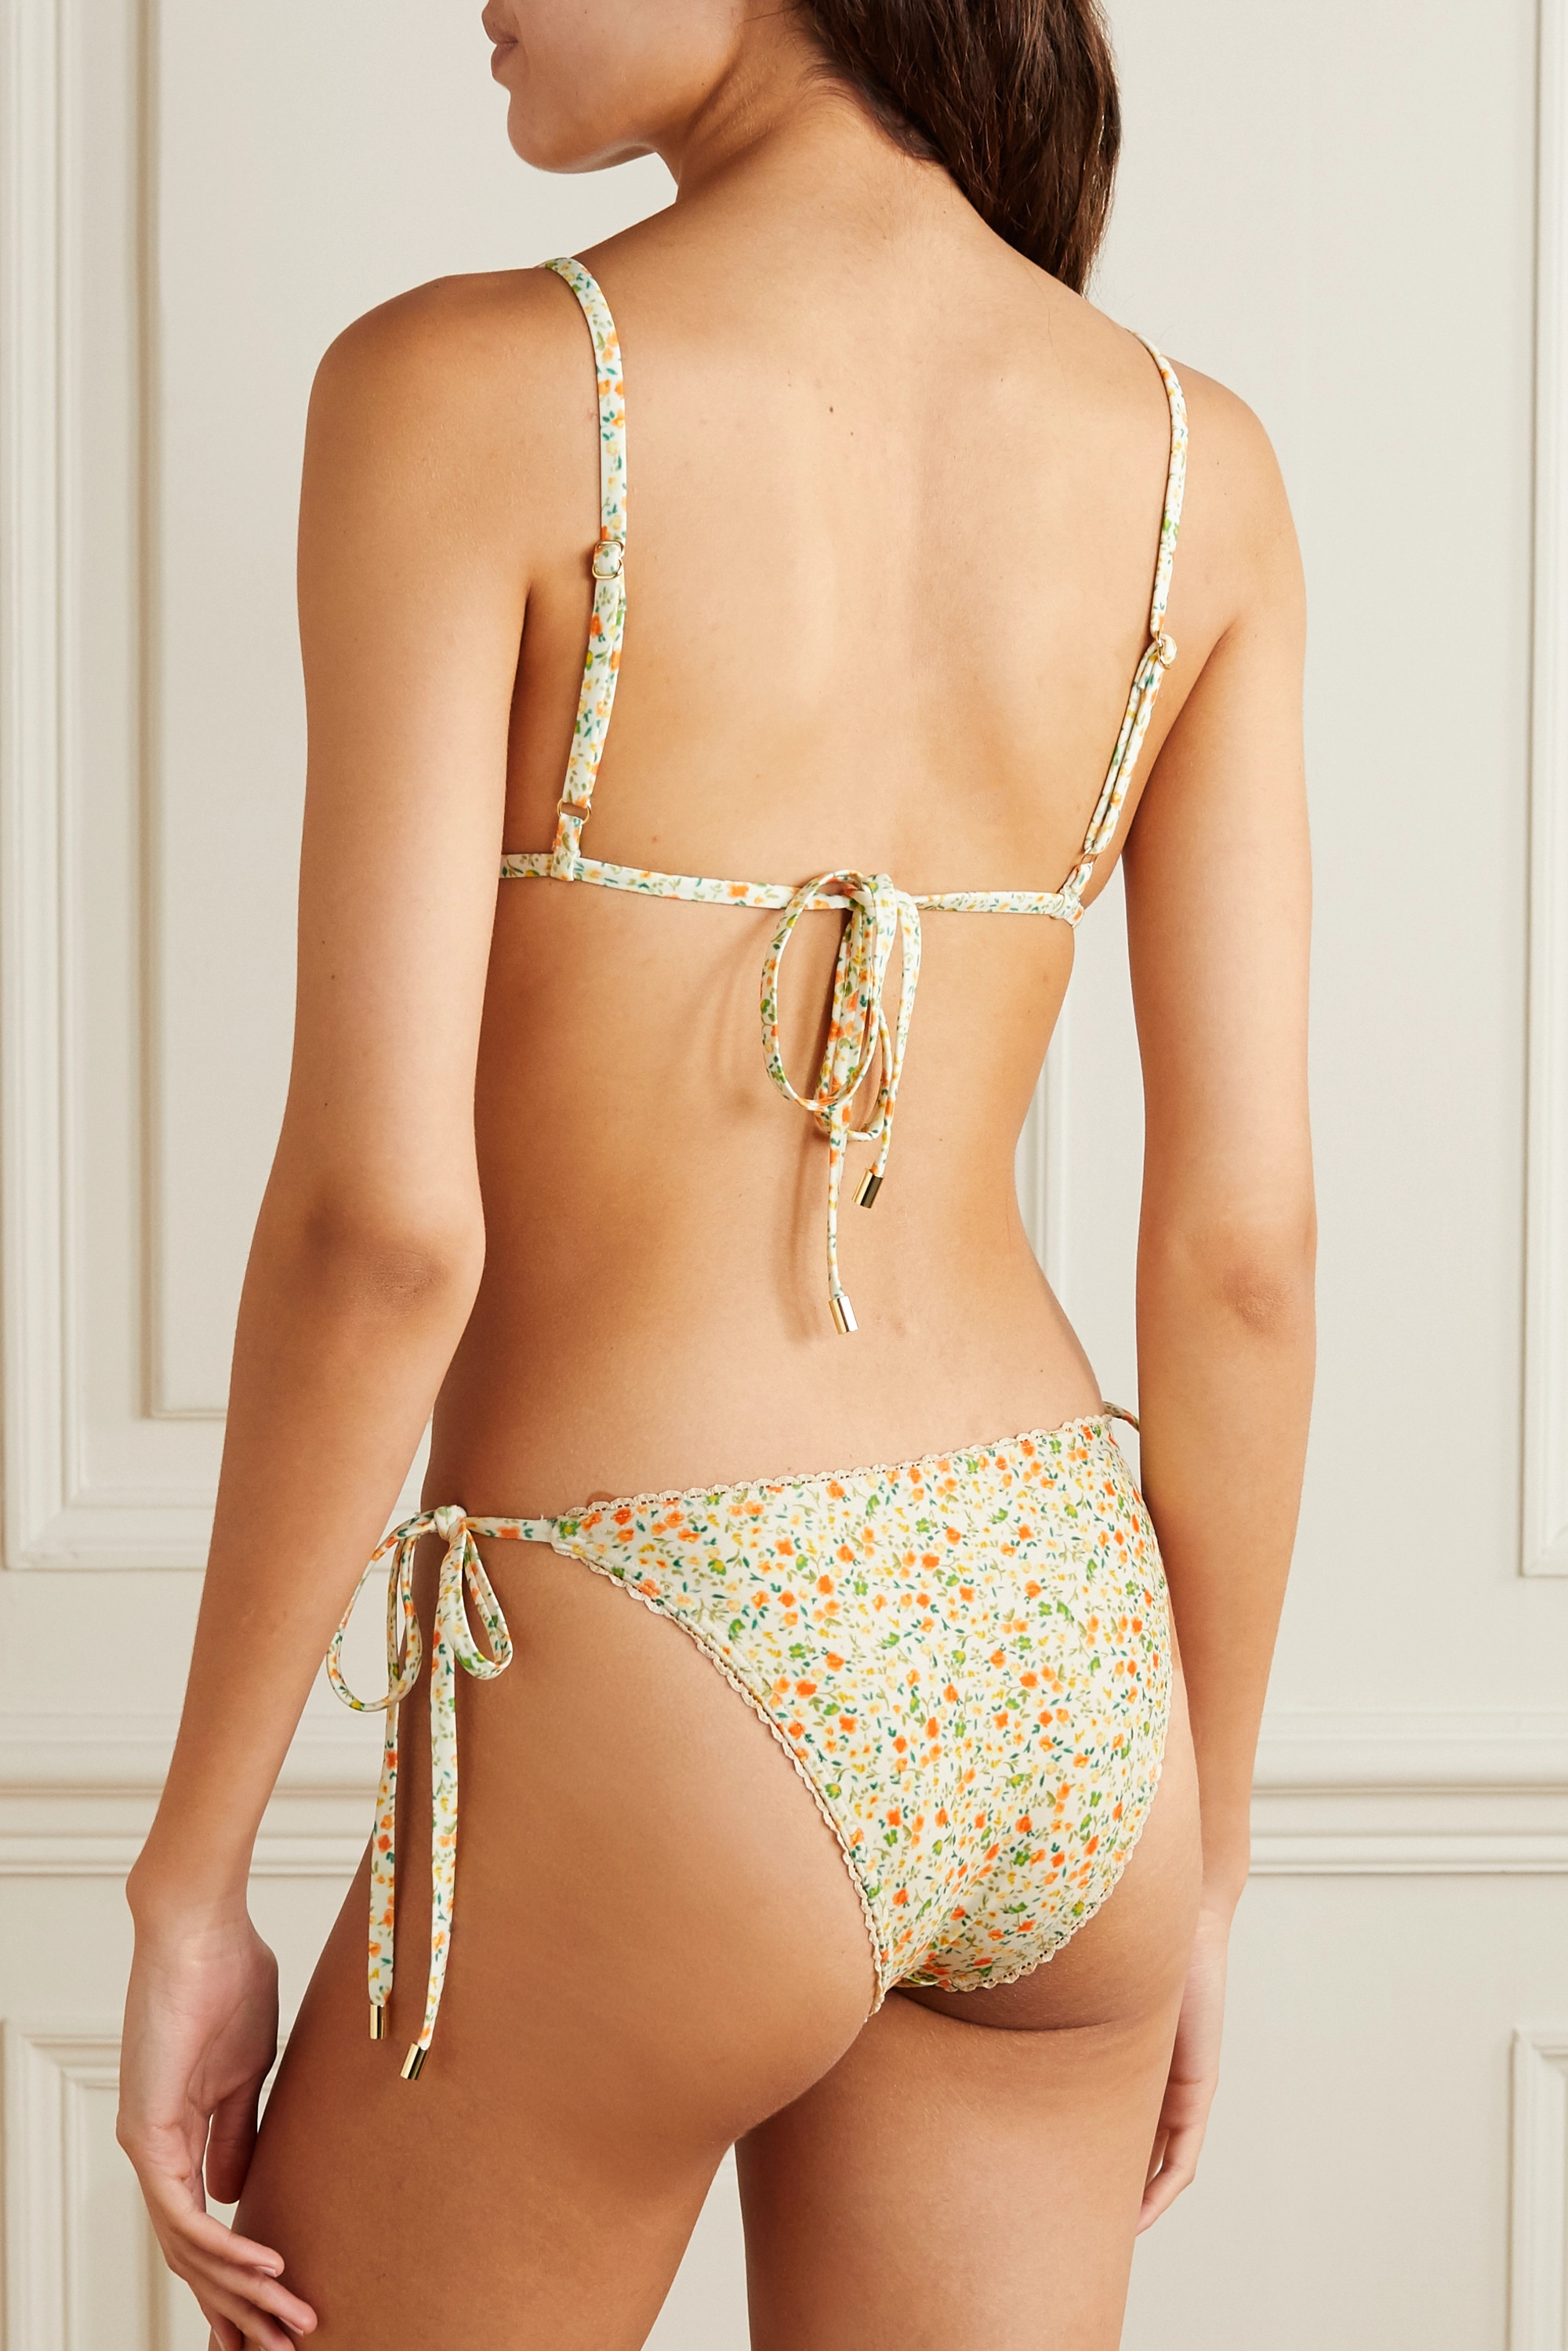 Peony + NET SUSTAIN crochet-trimmed floral-print stretch-ECONYL bikini top